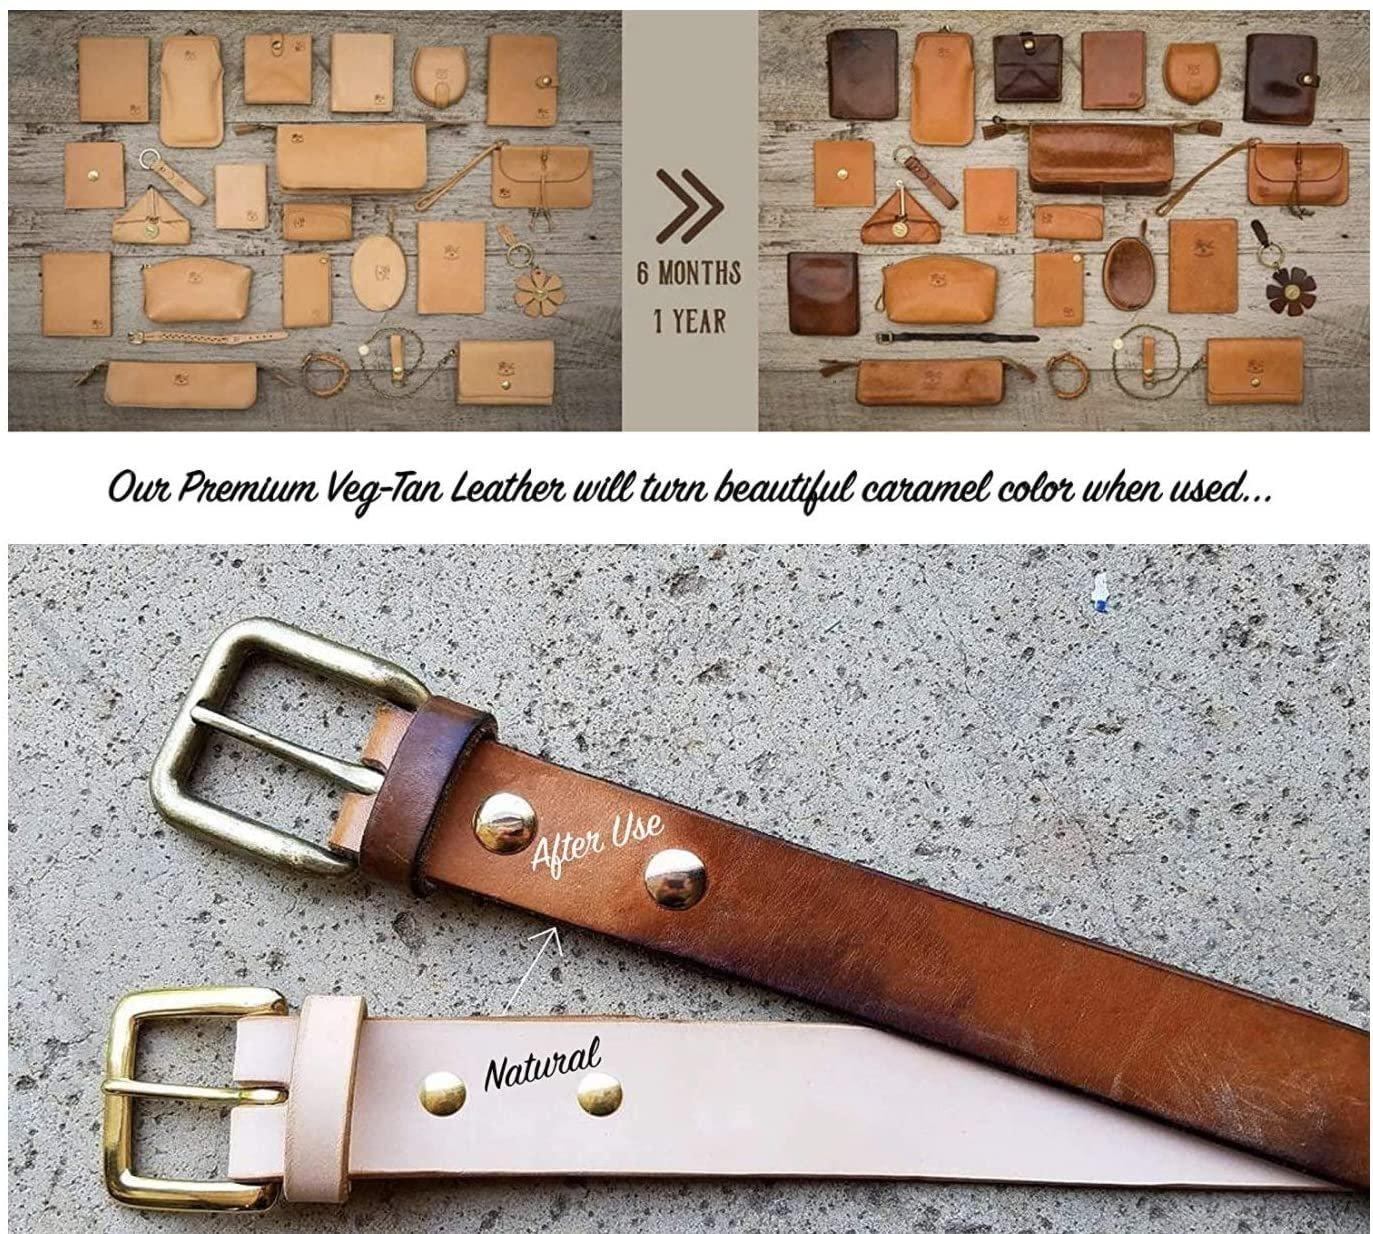 "Stonestreet Premium Natural Import Vegetable Veg Tan Tooling Stamping Carving Full Grain Cowhide Leather Strips Belt Blanks Straps 48-52 Length 3//4 6//7 8//9 oz Thickness 1-1//4/"" 6//7 oz"